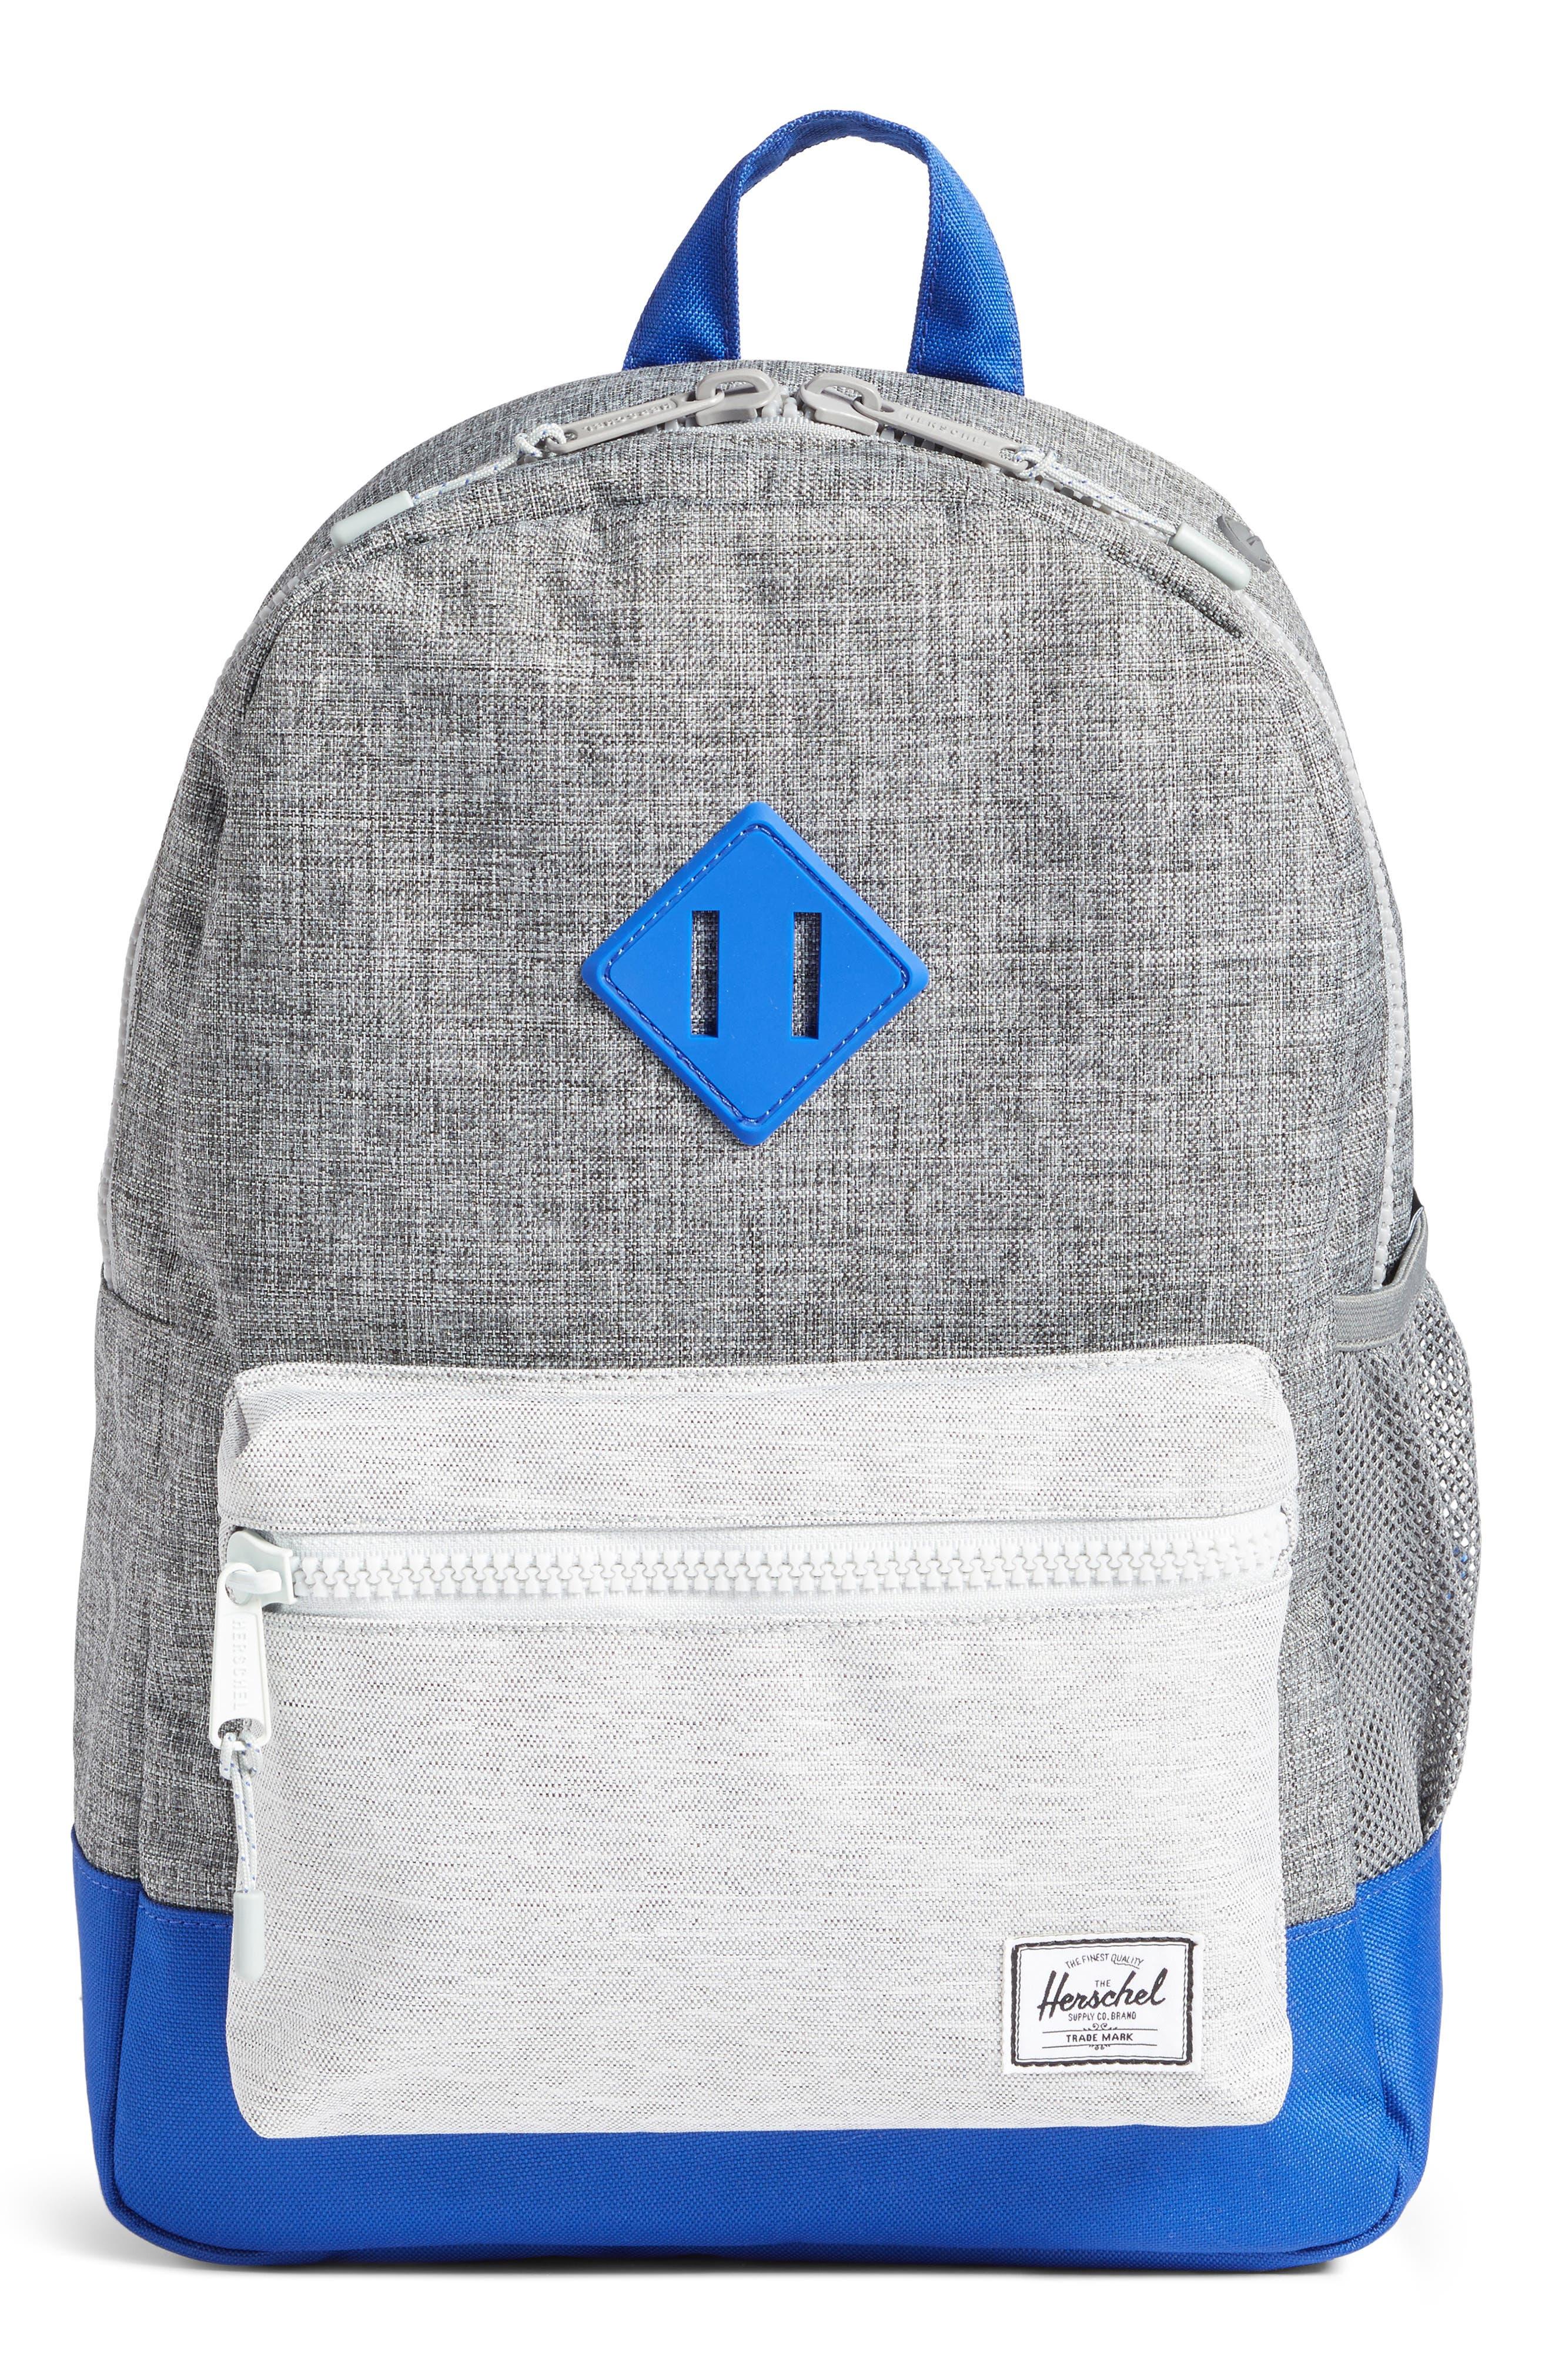 Heritage Colorblocked Backpack,                             Main thumbnail 1, color,                             Raven Crosshatch/ Surf Blue